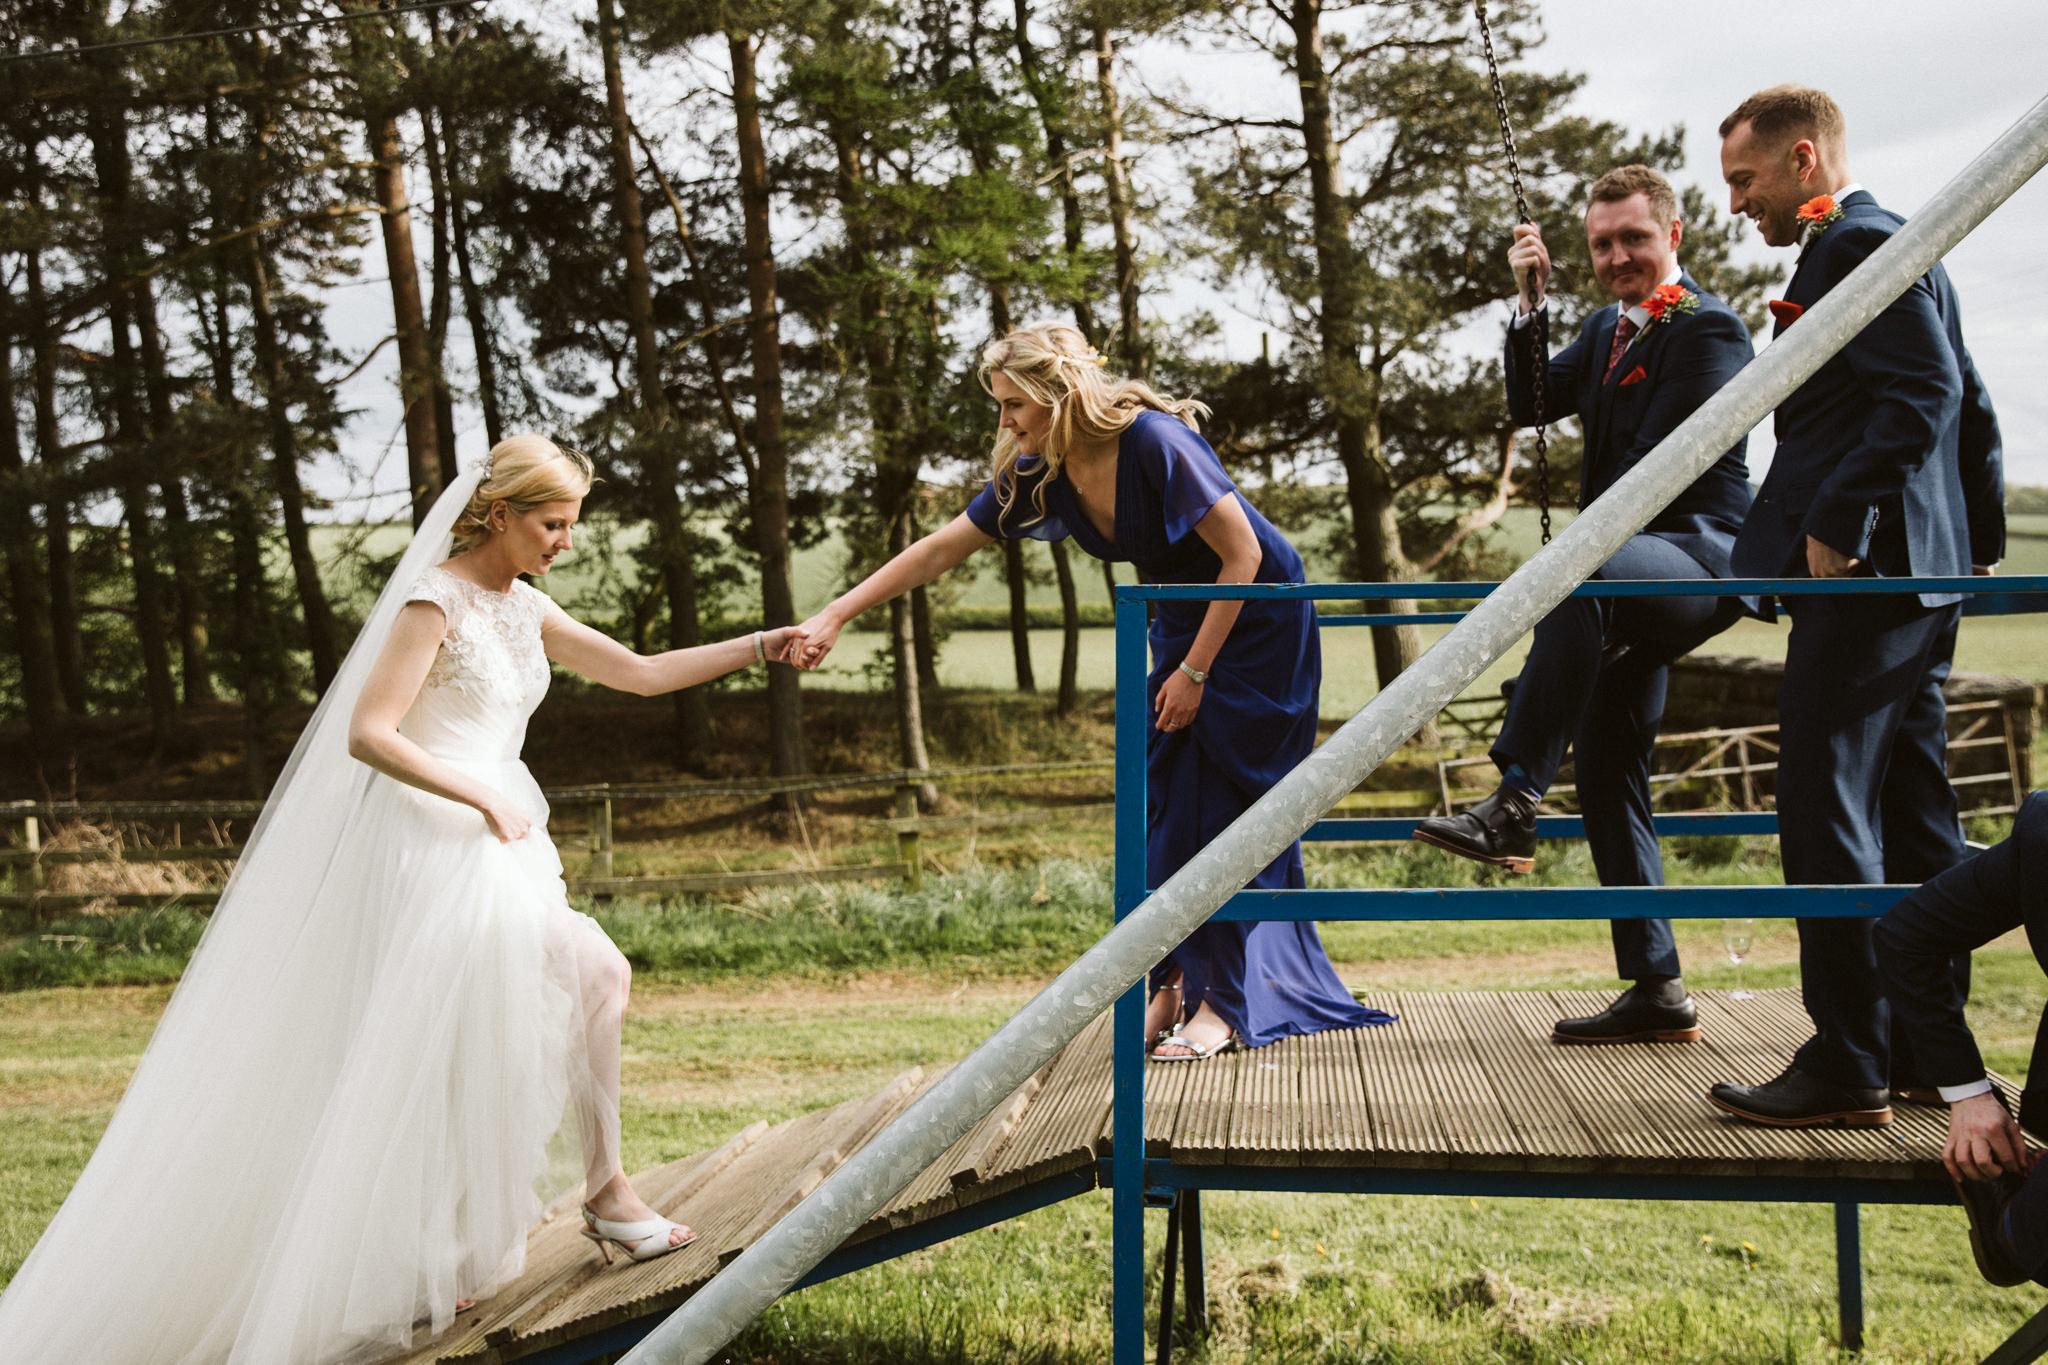 northside-farm-wedding-northumberland-margarita-hope (85).jpg